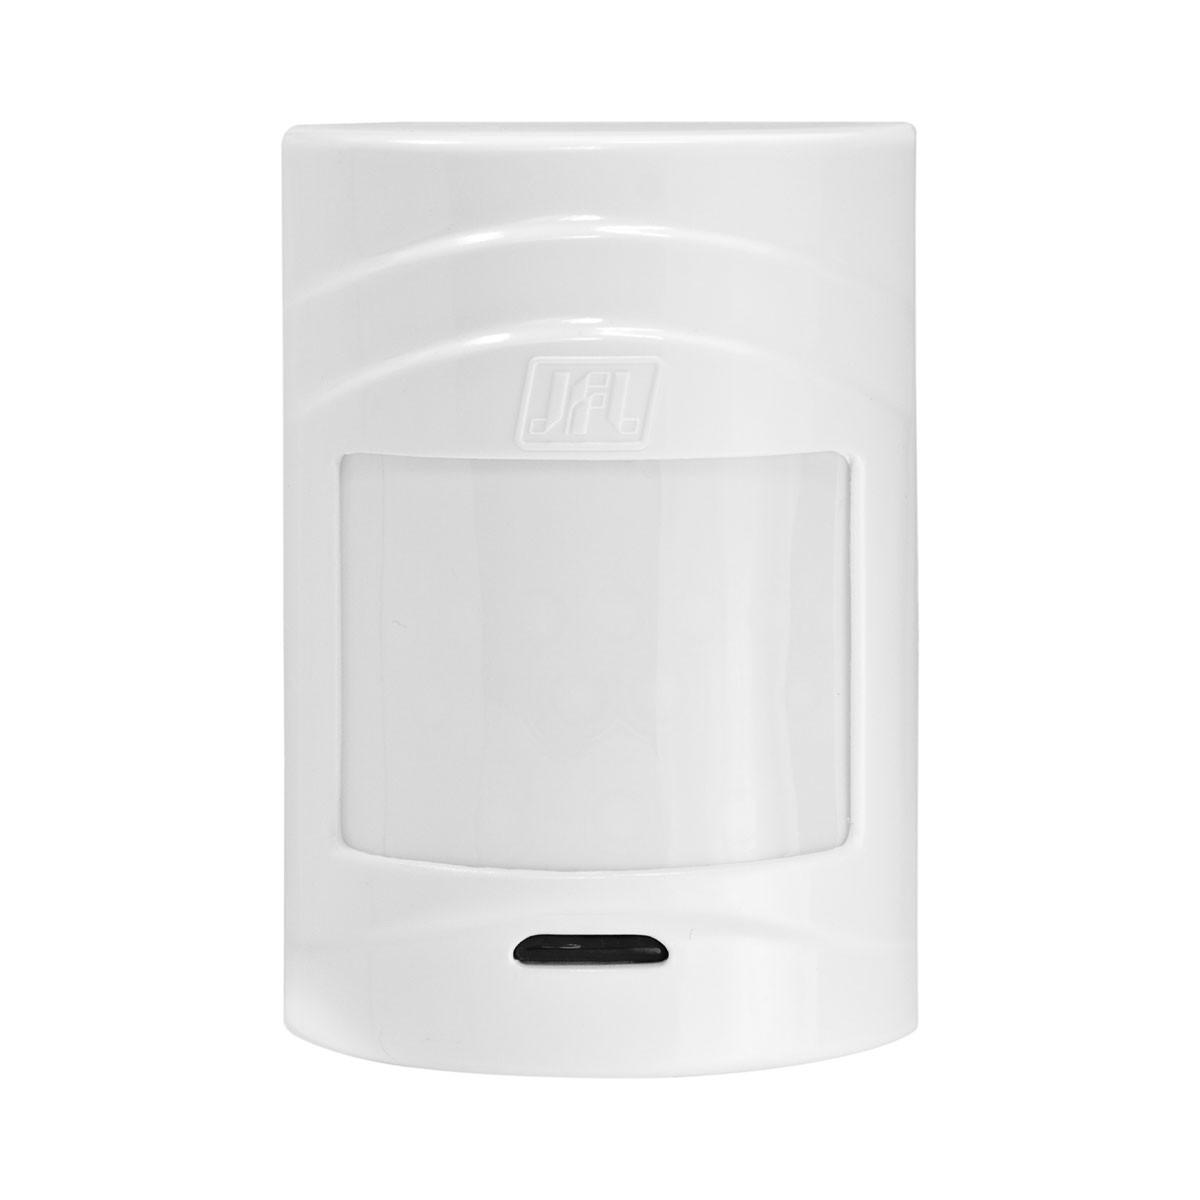 Kit Alarme Jfl, Active 20 Ethernet, Sensores Sem Fio, IrPet 530 Sf